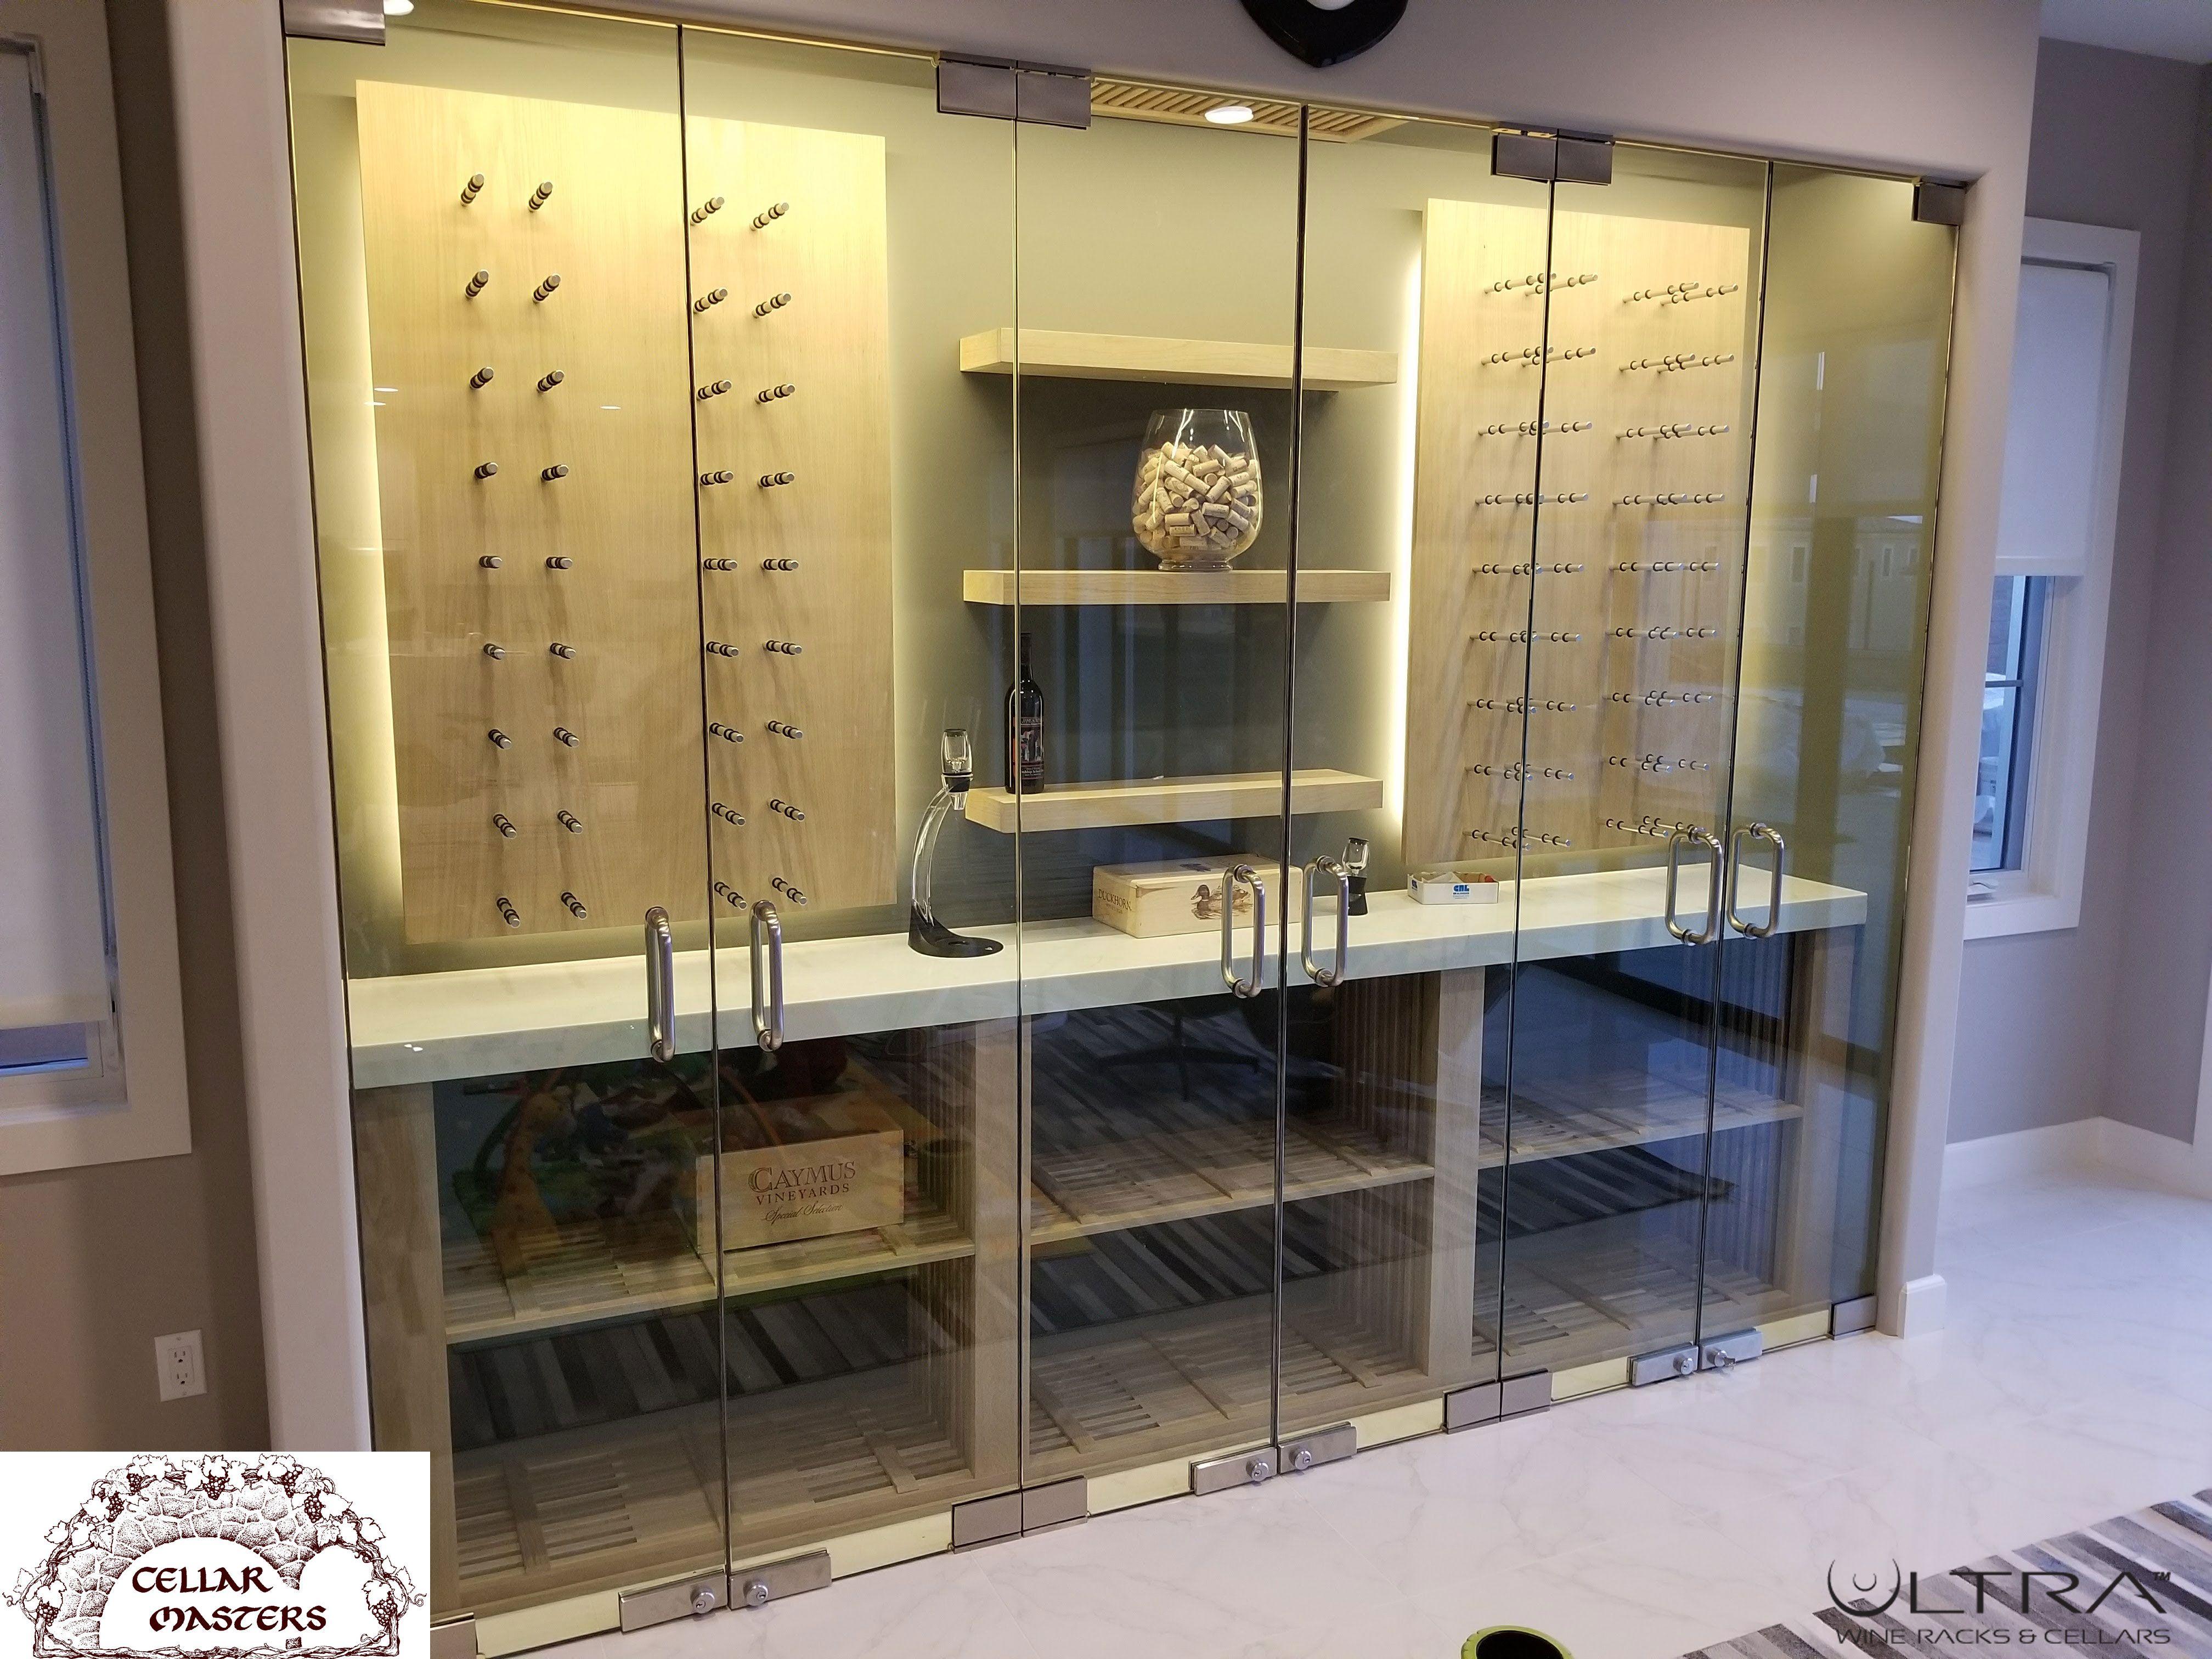 Küchenideen stein pin by ultra wine racks u cellars on wine cellar ideas  pinterest